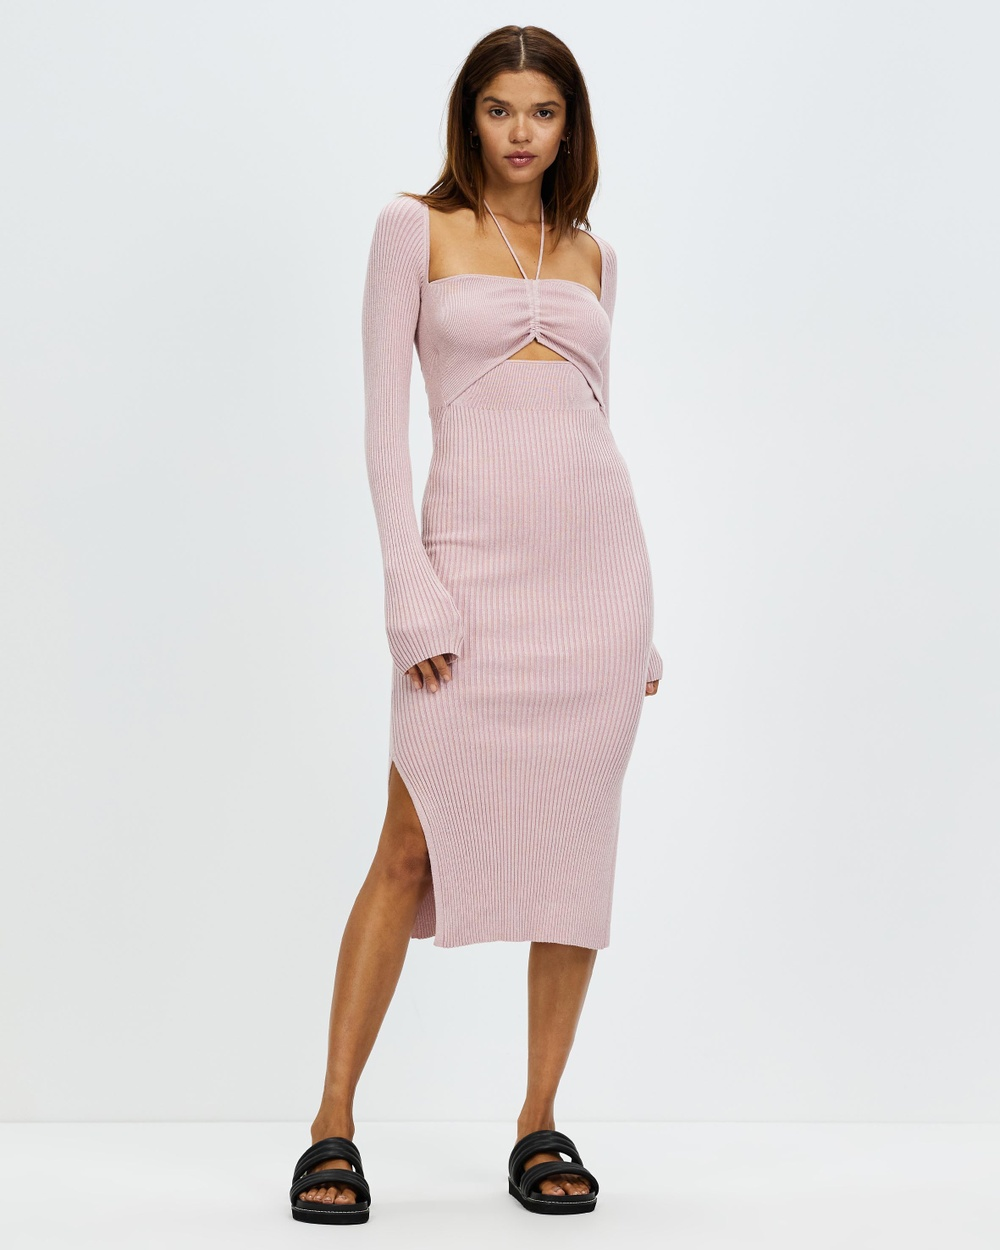 AERE Halter Knit Dress Bodycon Dresses Pink